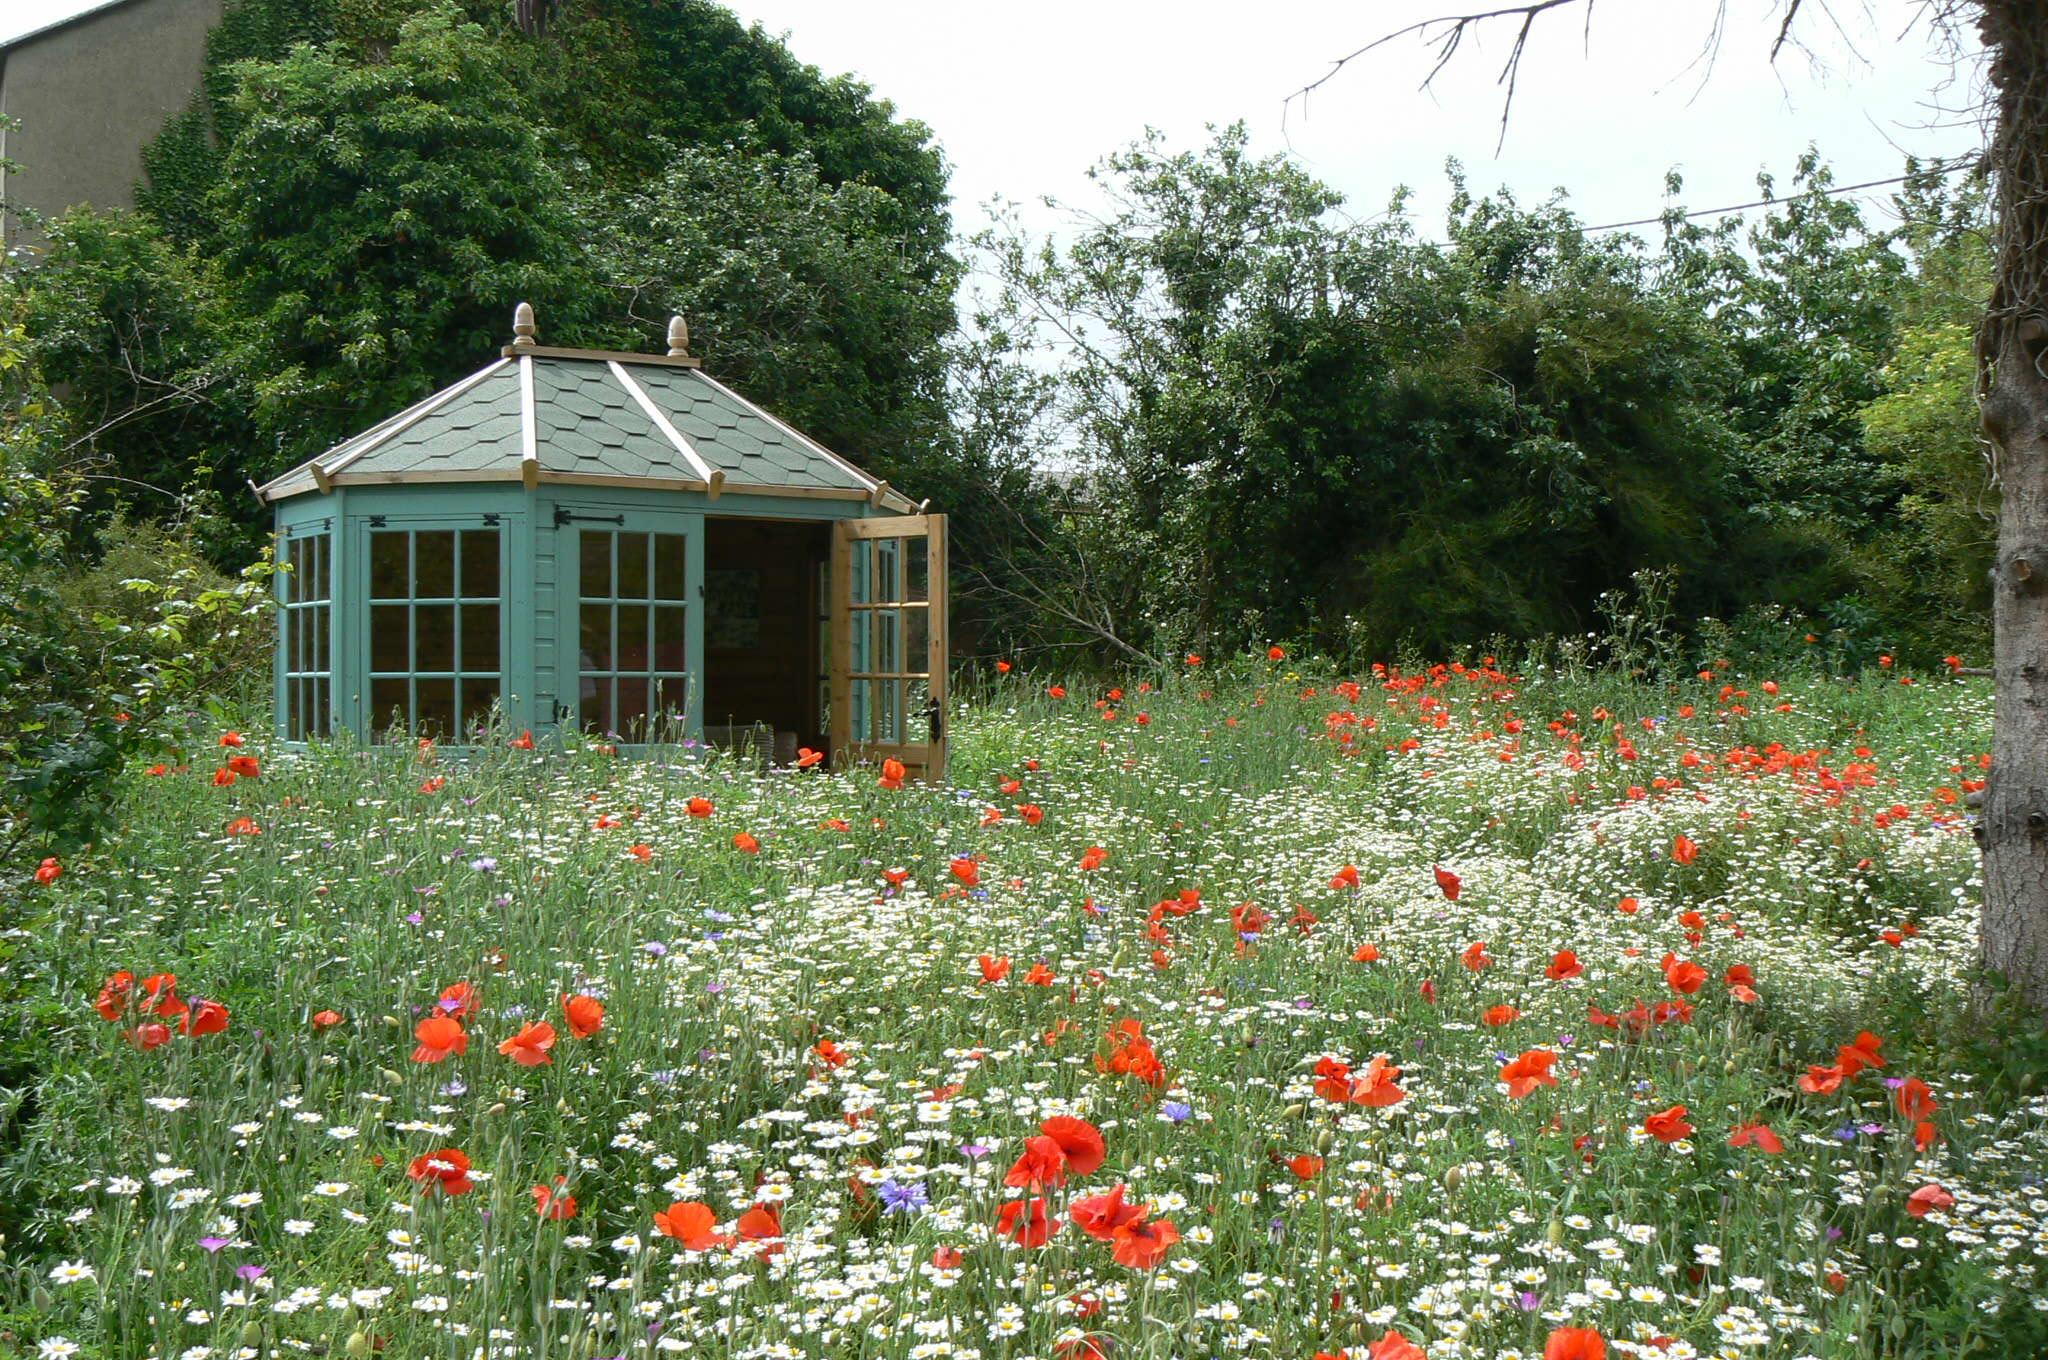 Wildflower meadow. Photo by Tim Evans